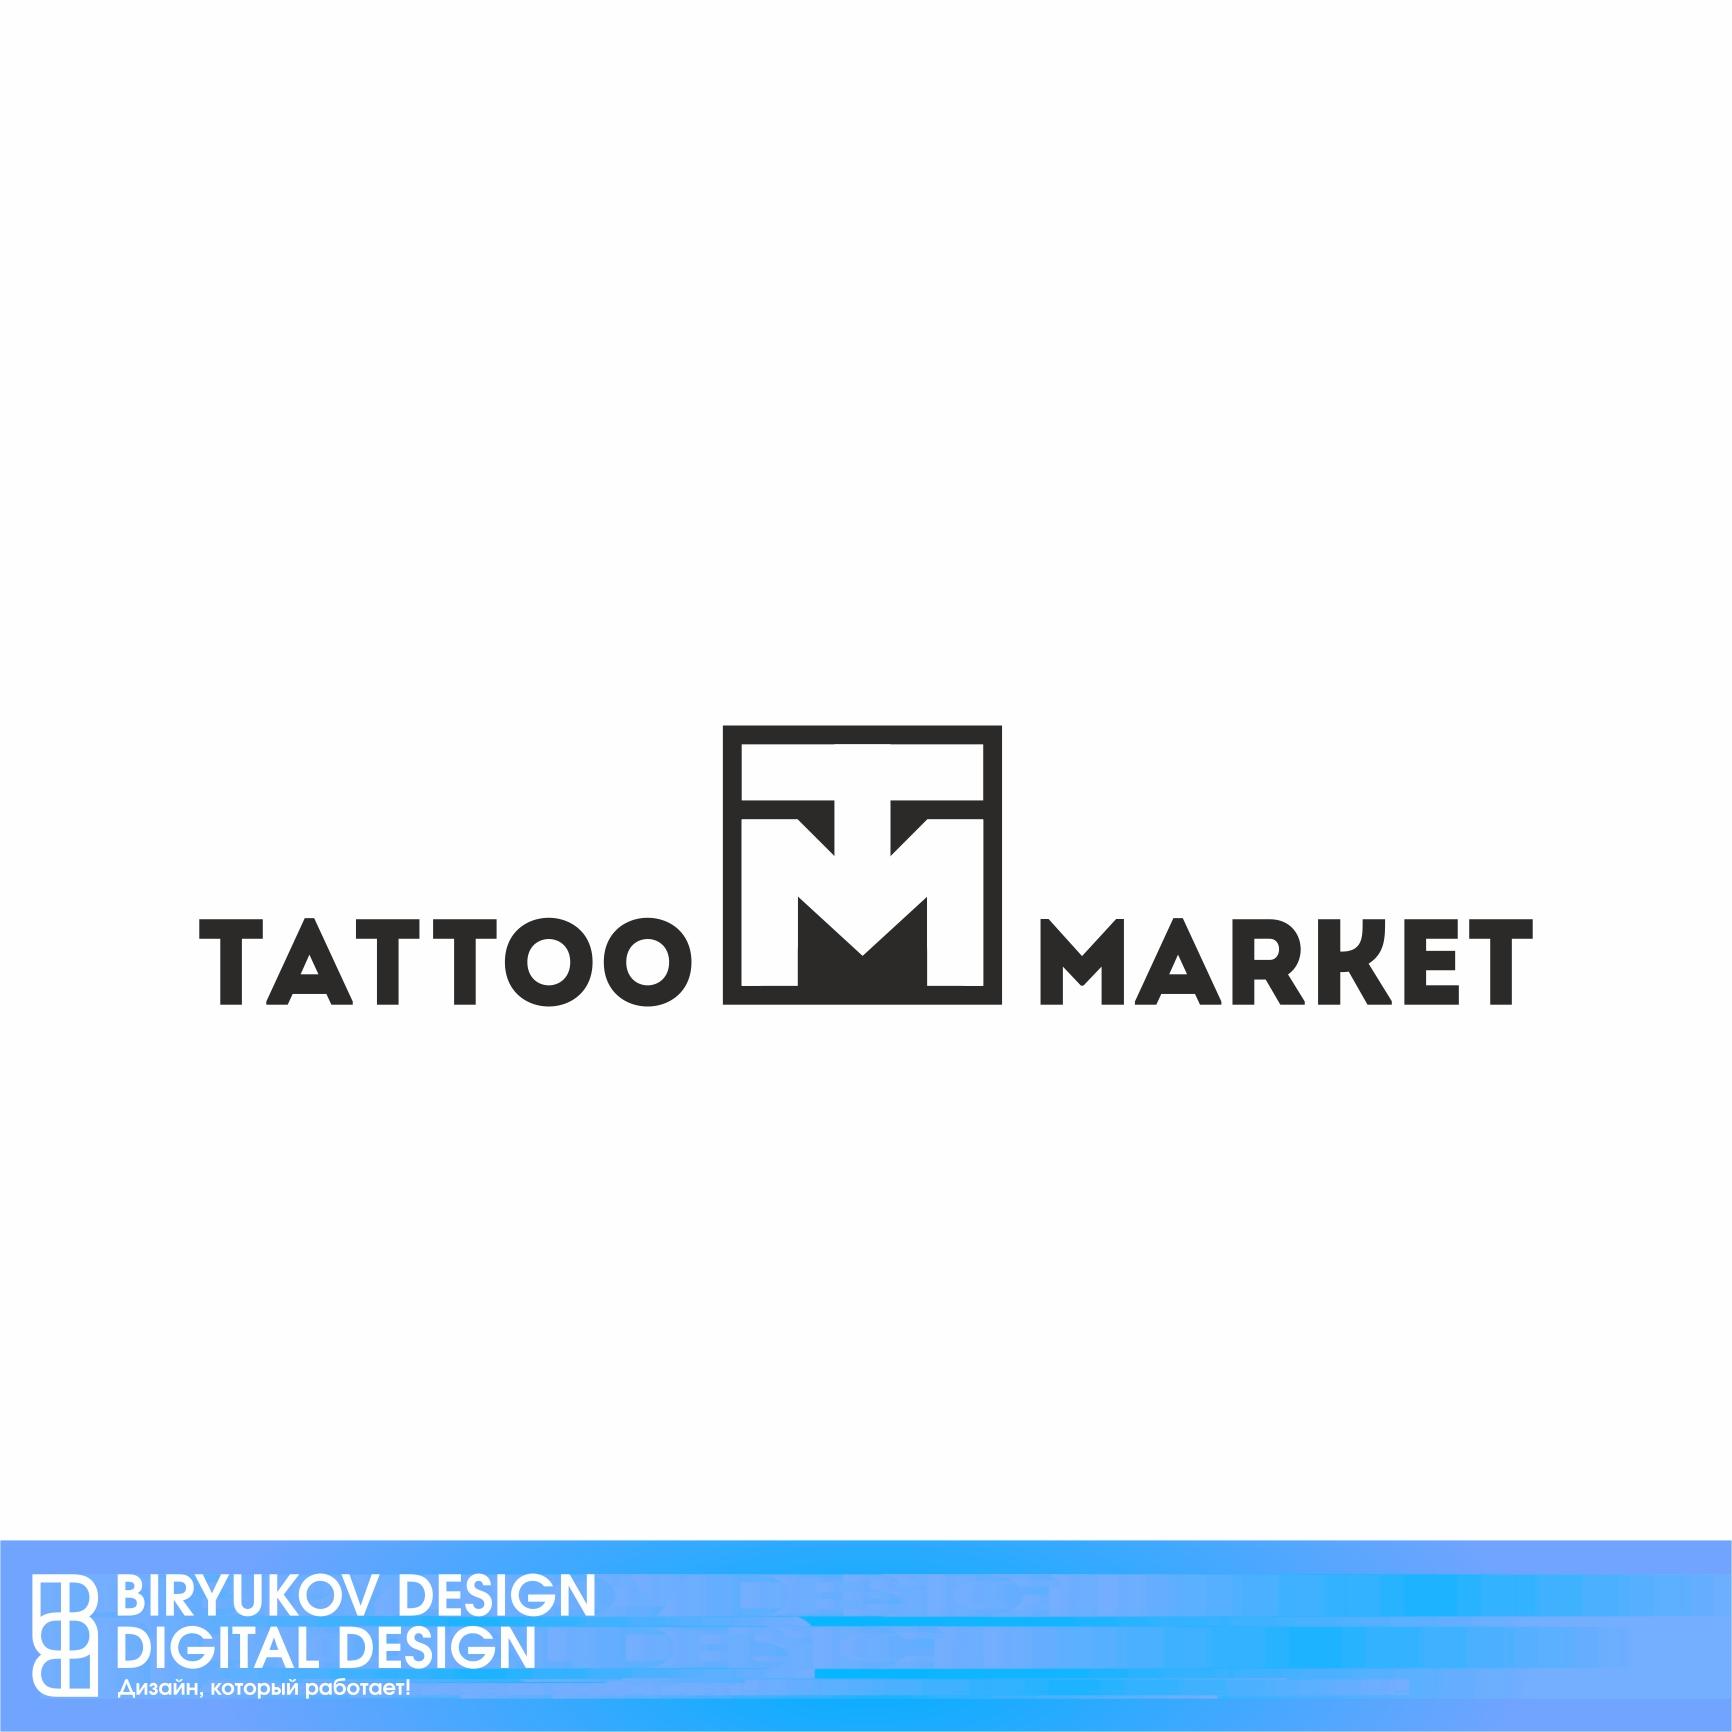 Редизайн логотипа магазина тату оборудования TattooMarket.ru фото f_8095c3a4bc39db58.jpg